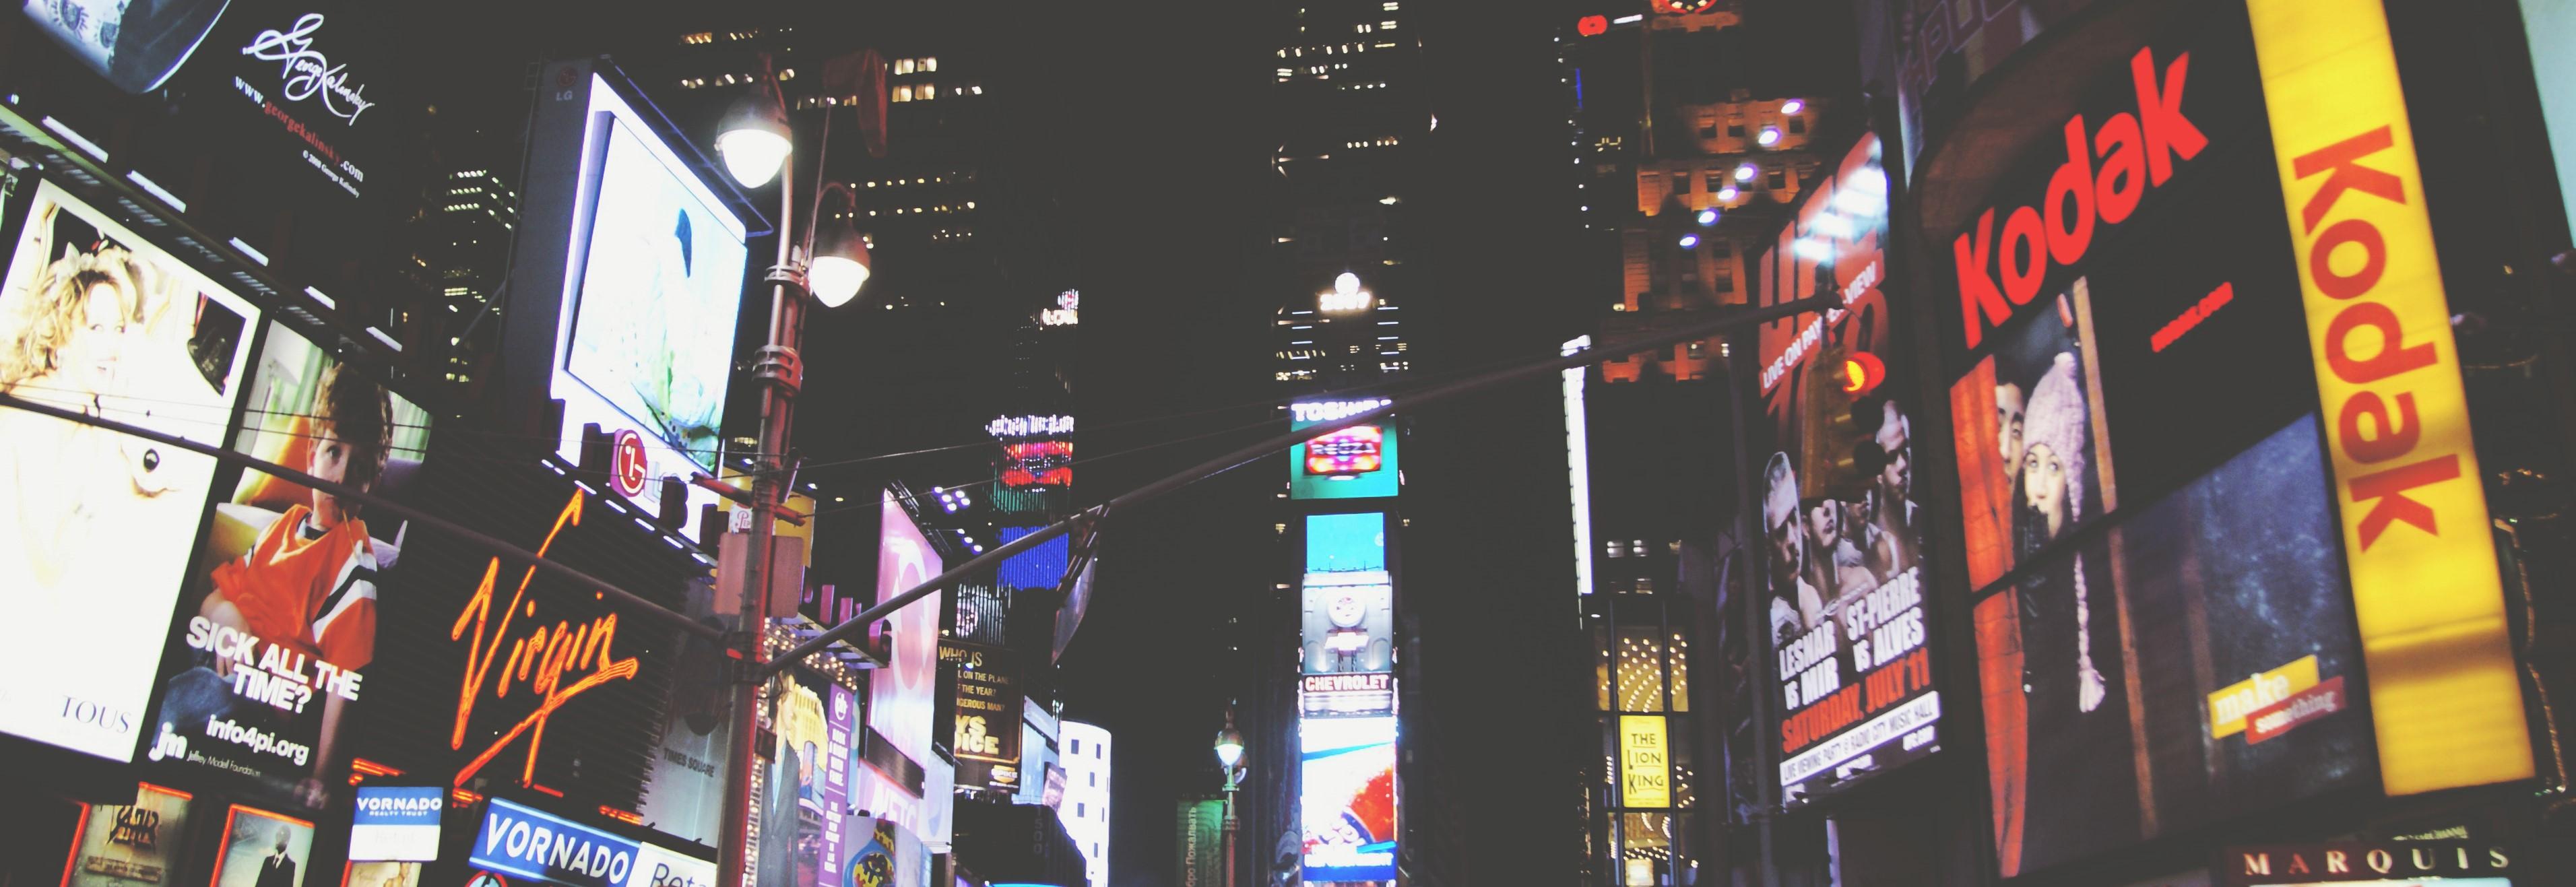 city-marketing-lights-night.jpg